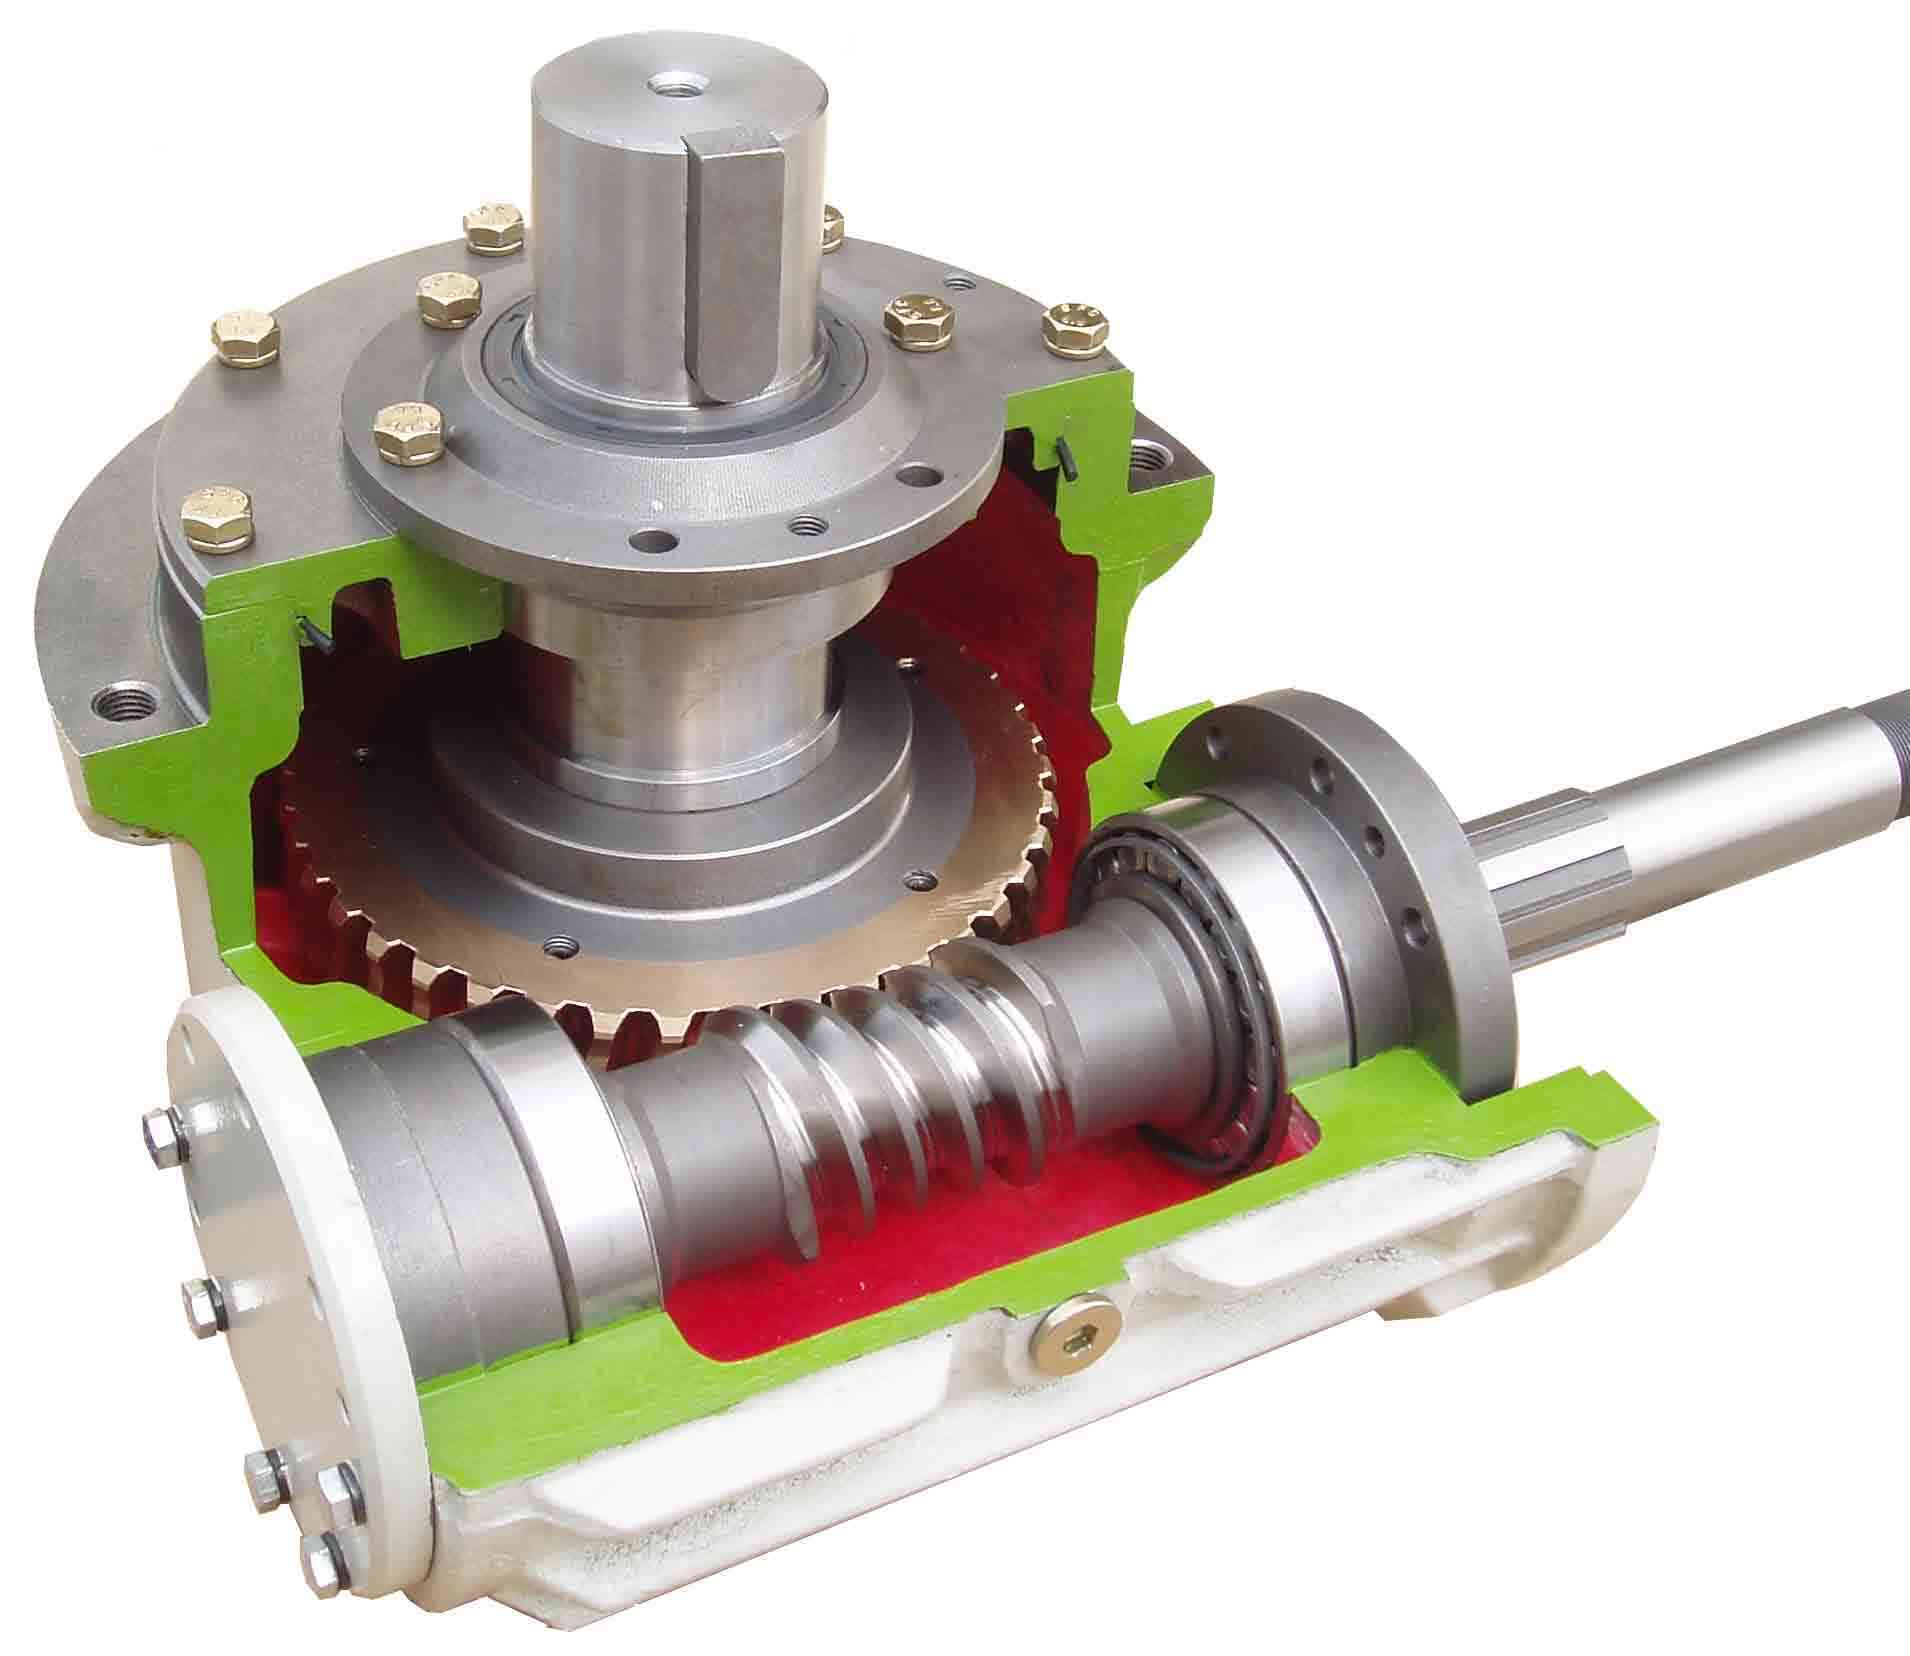 圆柱齿轮减速机结构图